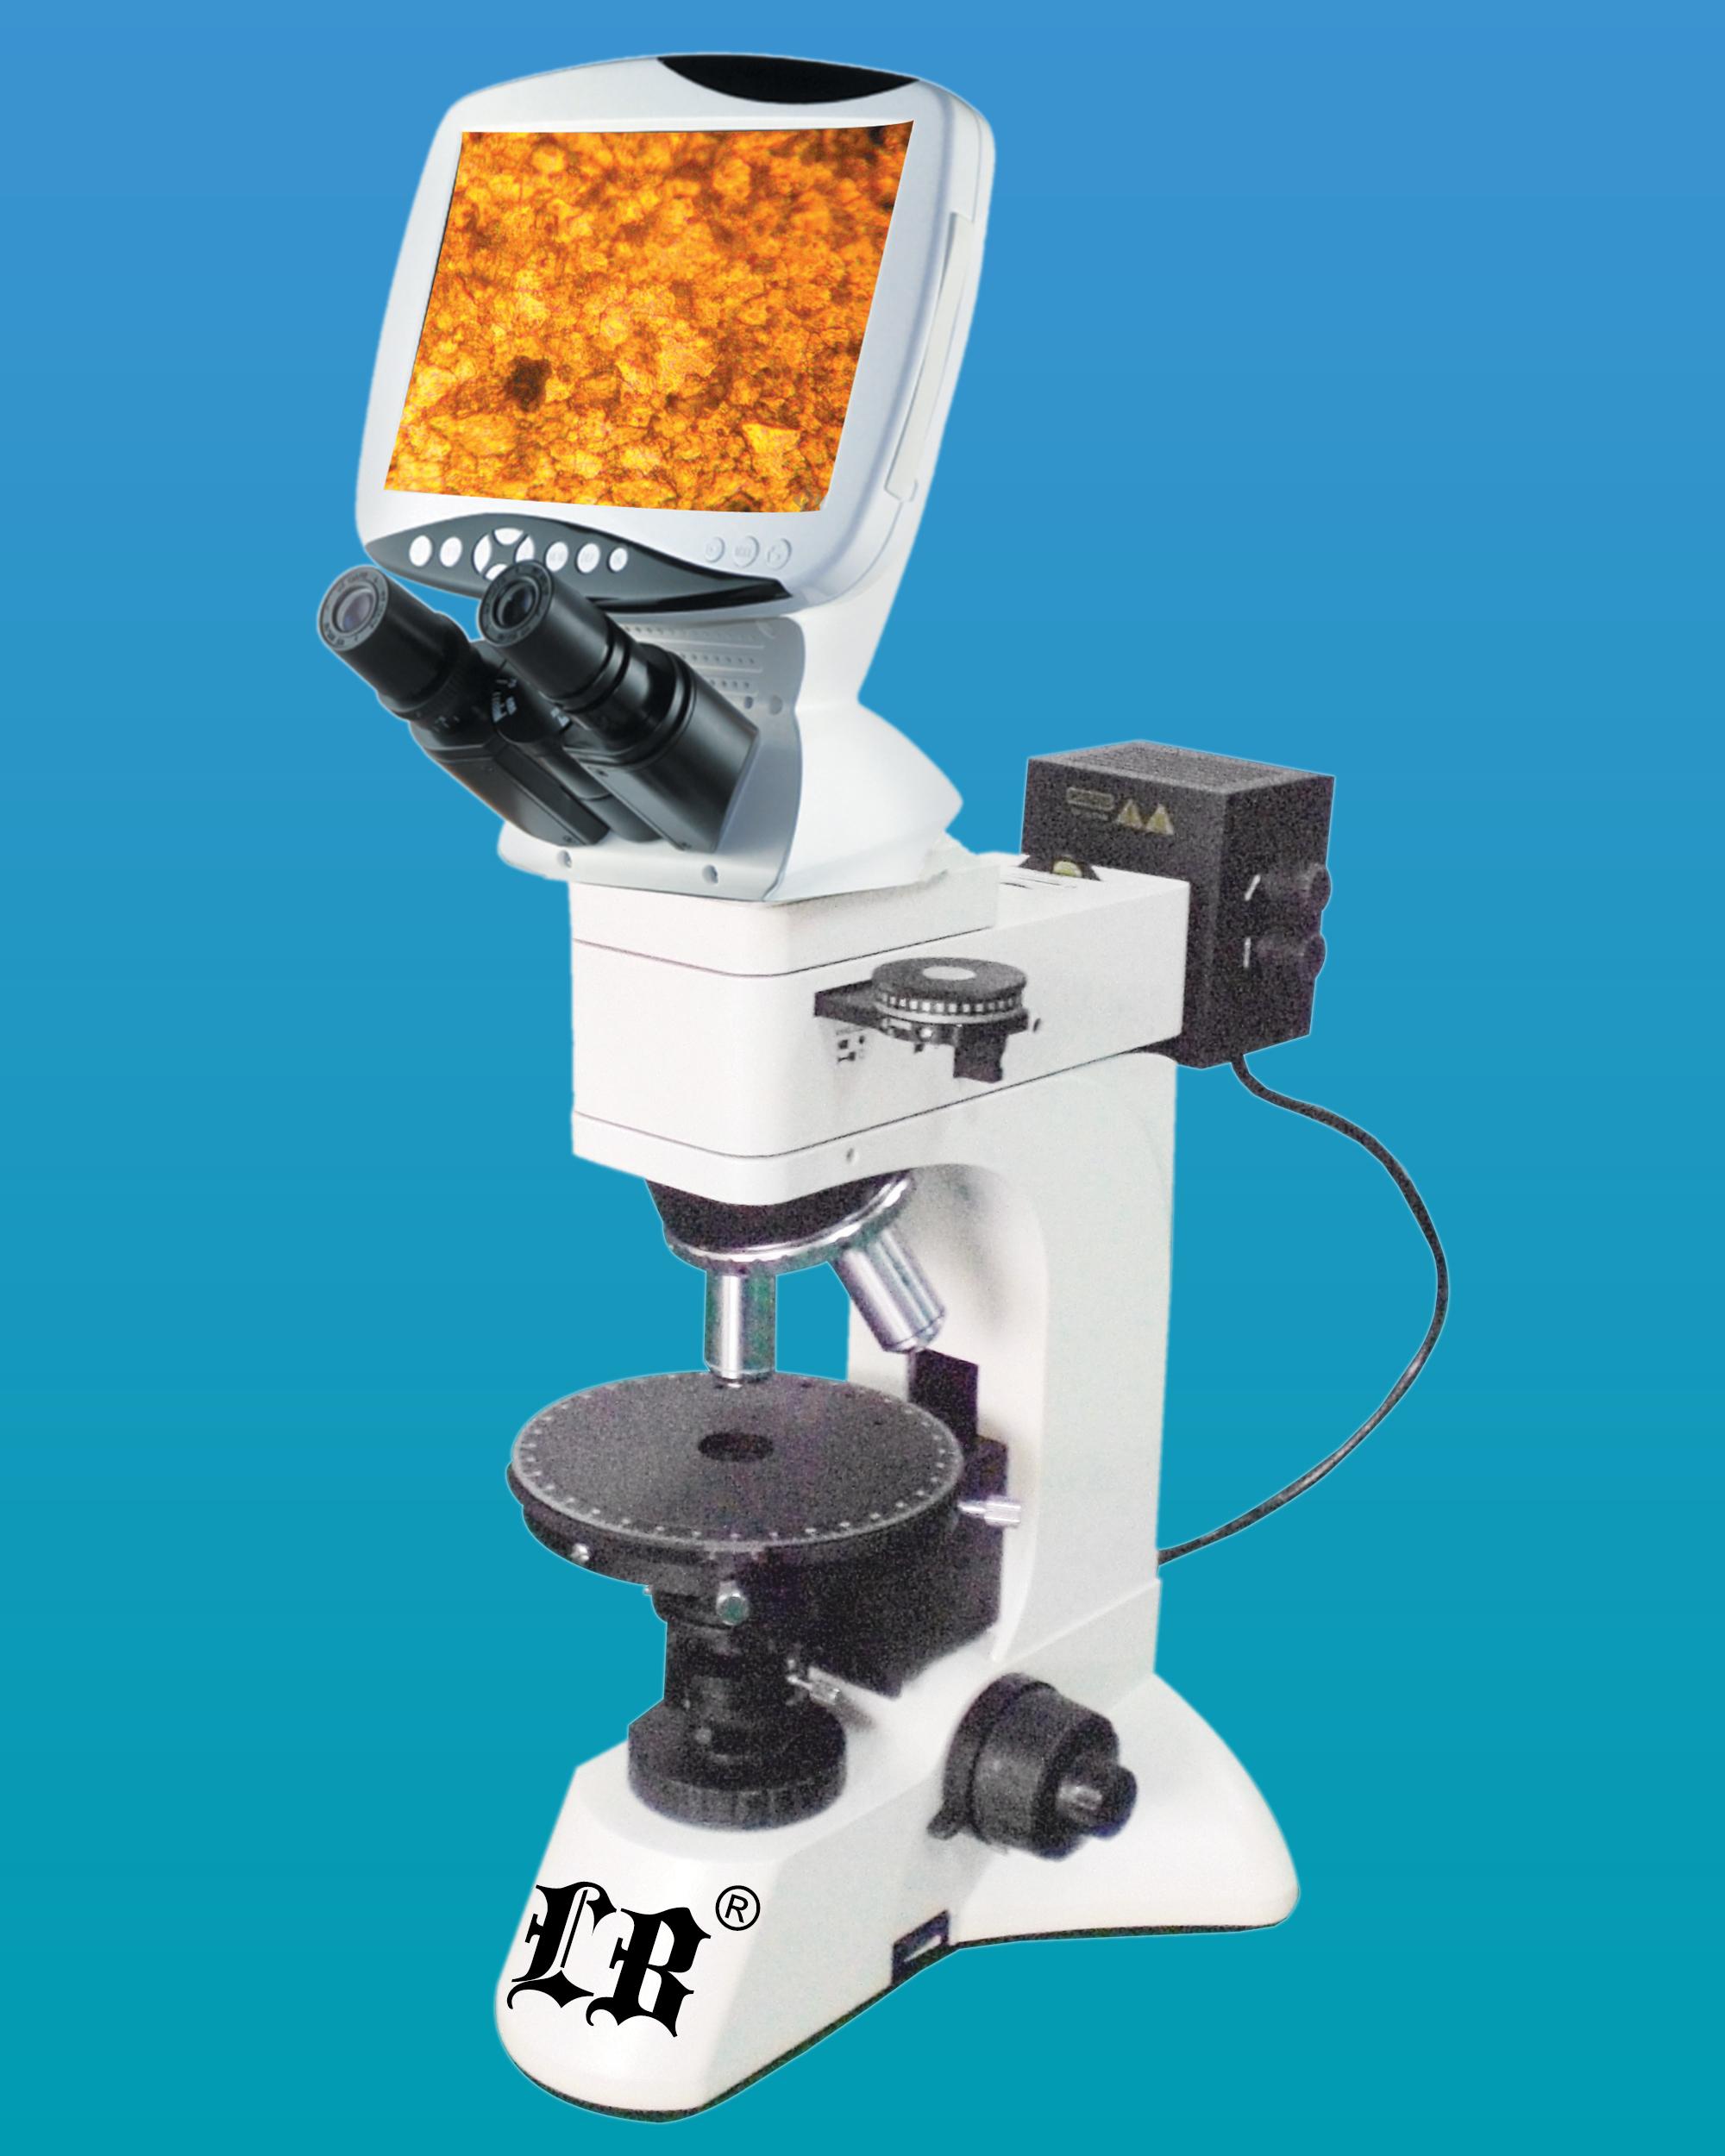 [LB-1500] Digital LCD Polarizing Microscope w/ 12.0MP Camera